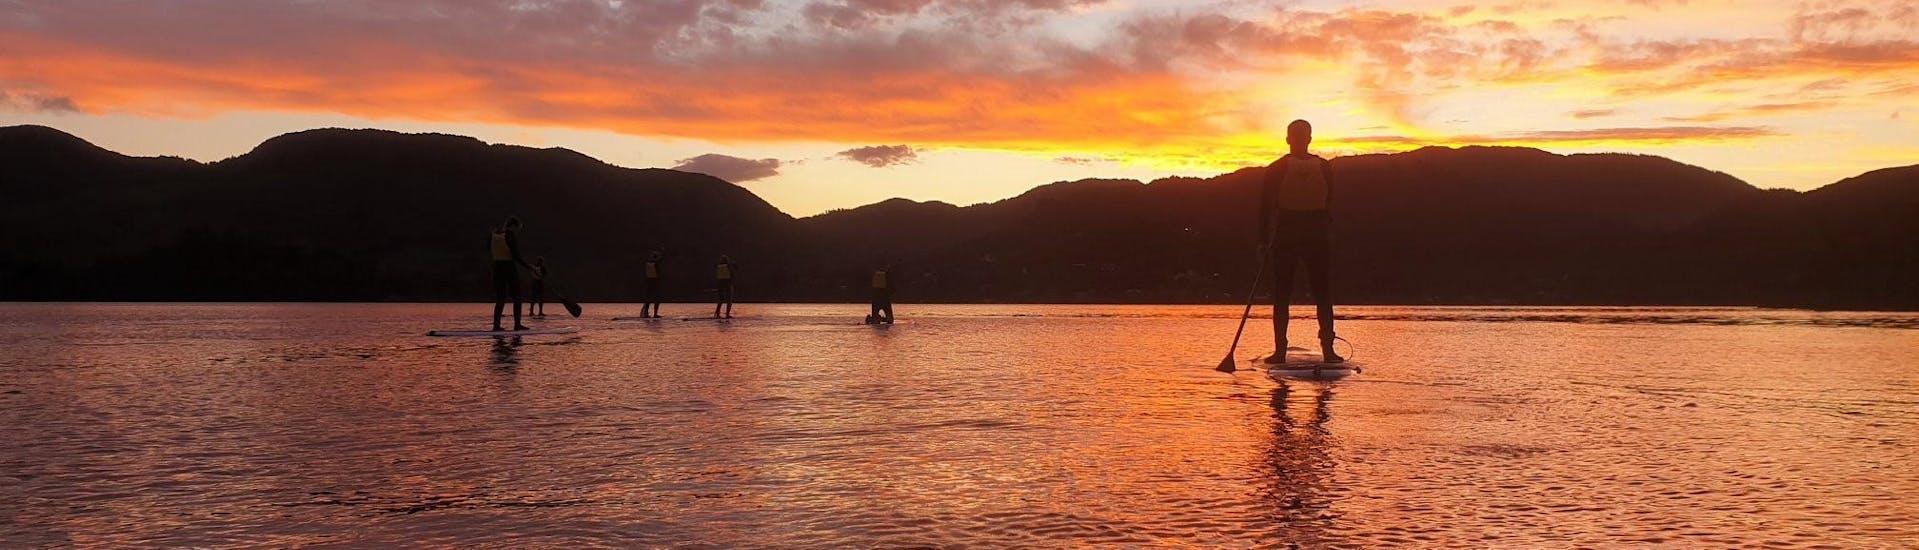 Paddle Board Rotorua - Glow Worm Tour incl. Transfer